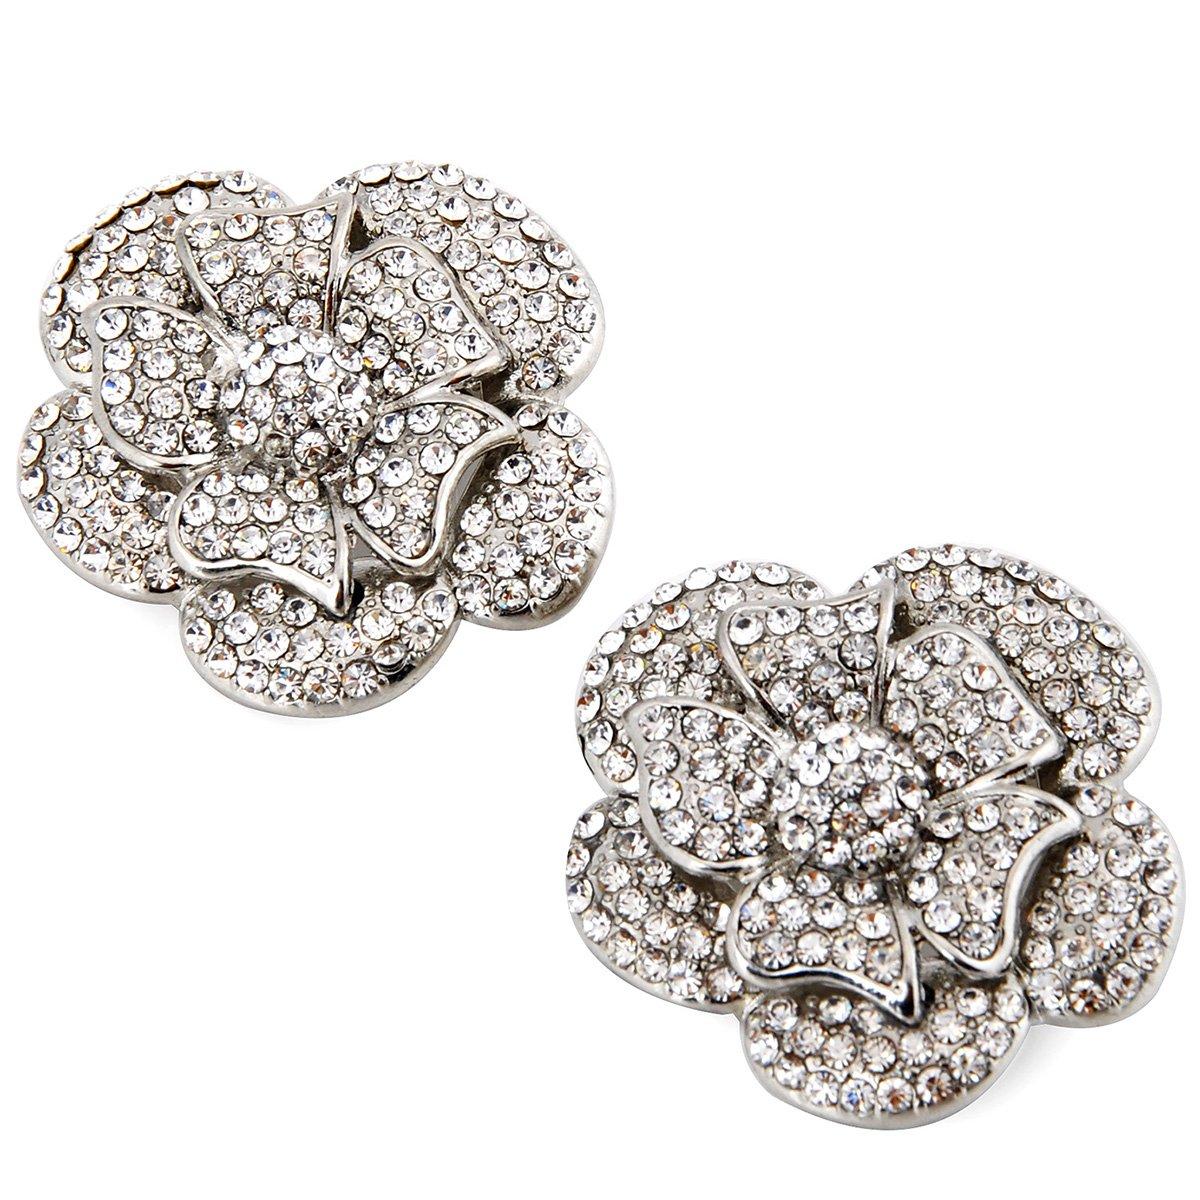 ElegantPark AF Fashion ivory Pearls Rhinestones Shoes Dress Hat Shoe Clips 2 Pcs